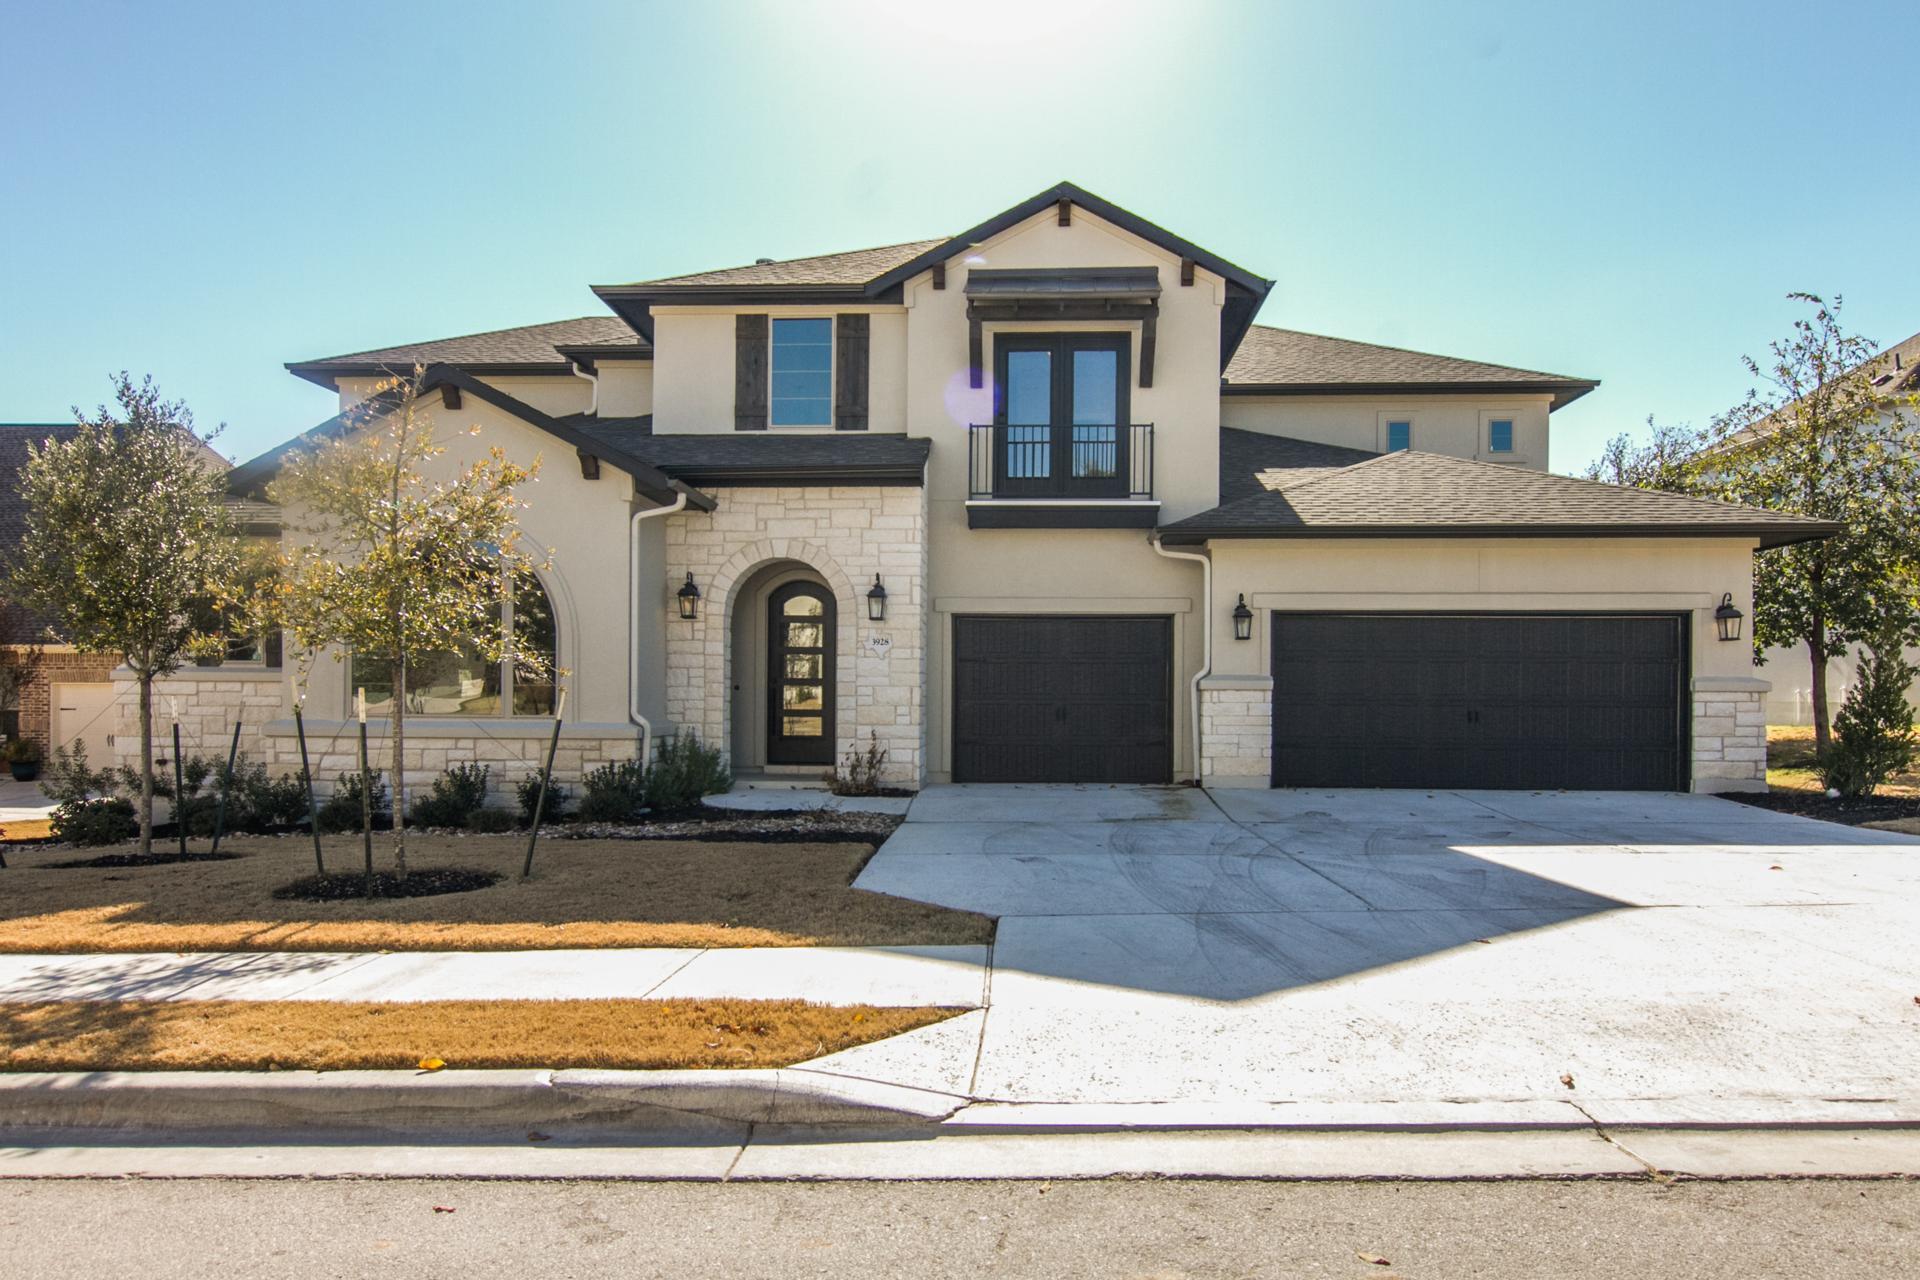 Single Family for Active at Delano 3928 Venezia View Leander, Texas 78641 United States